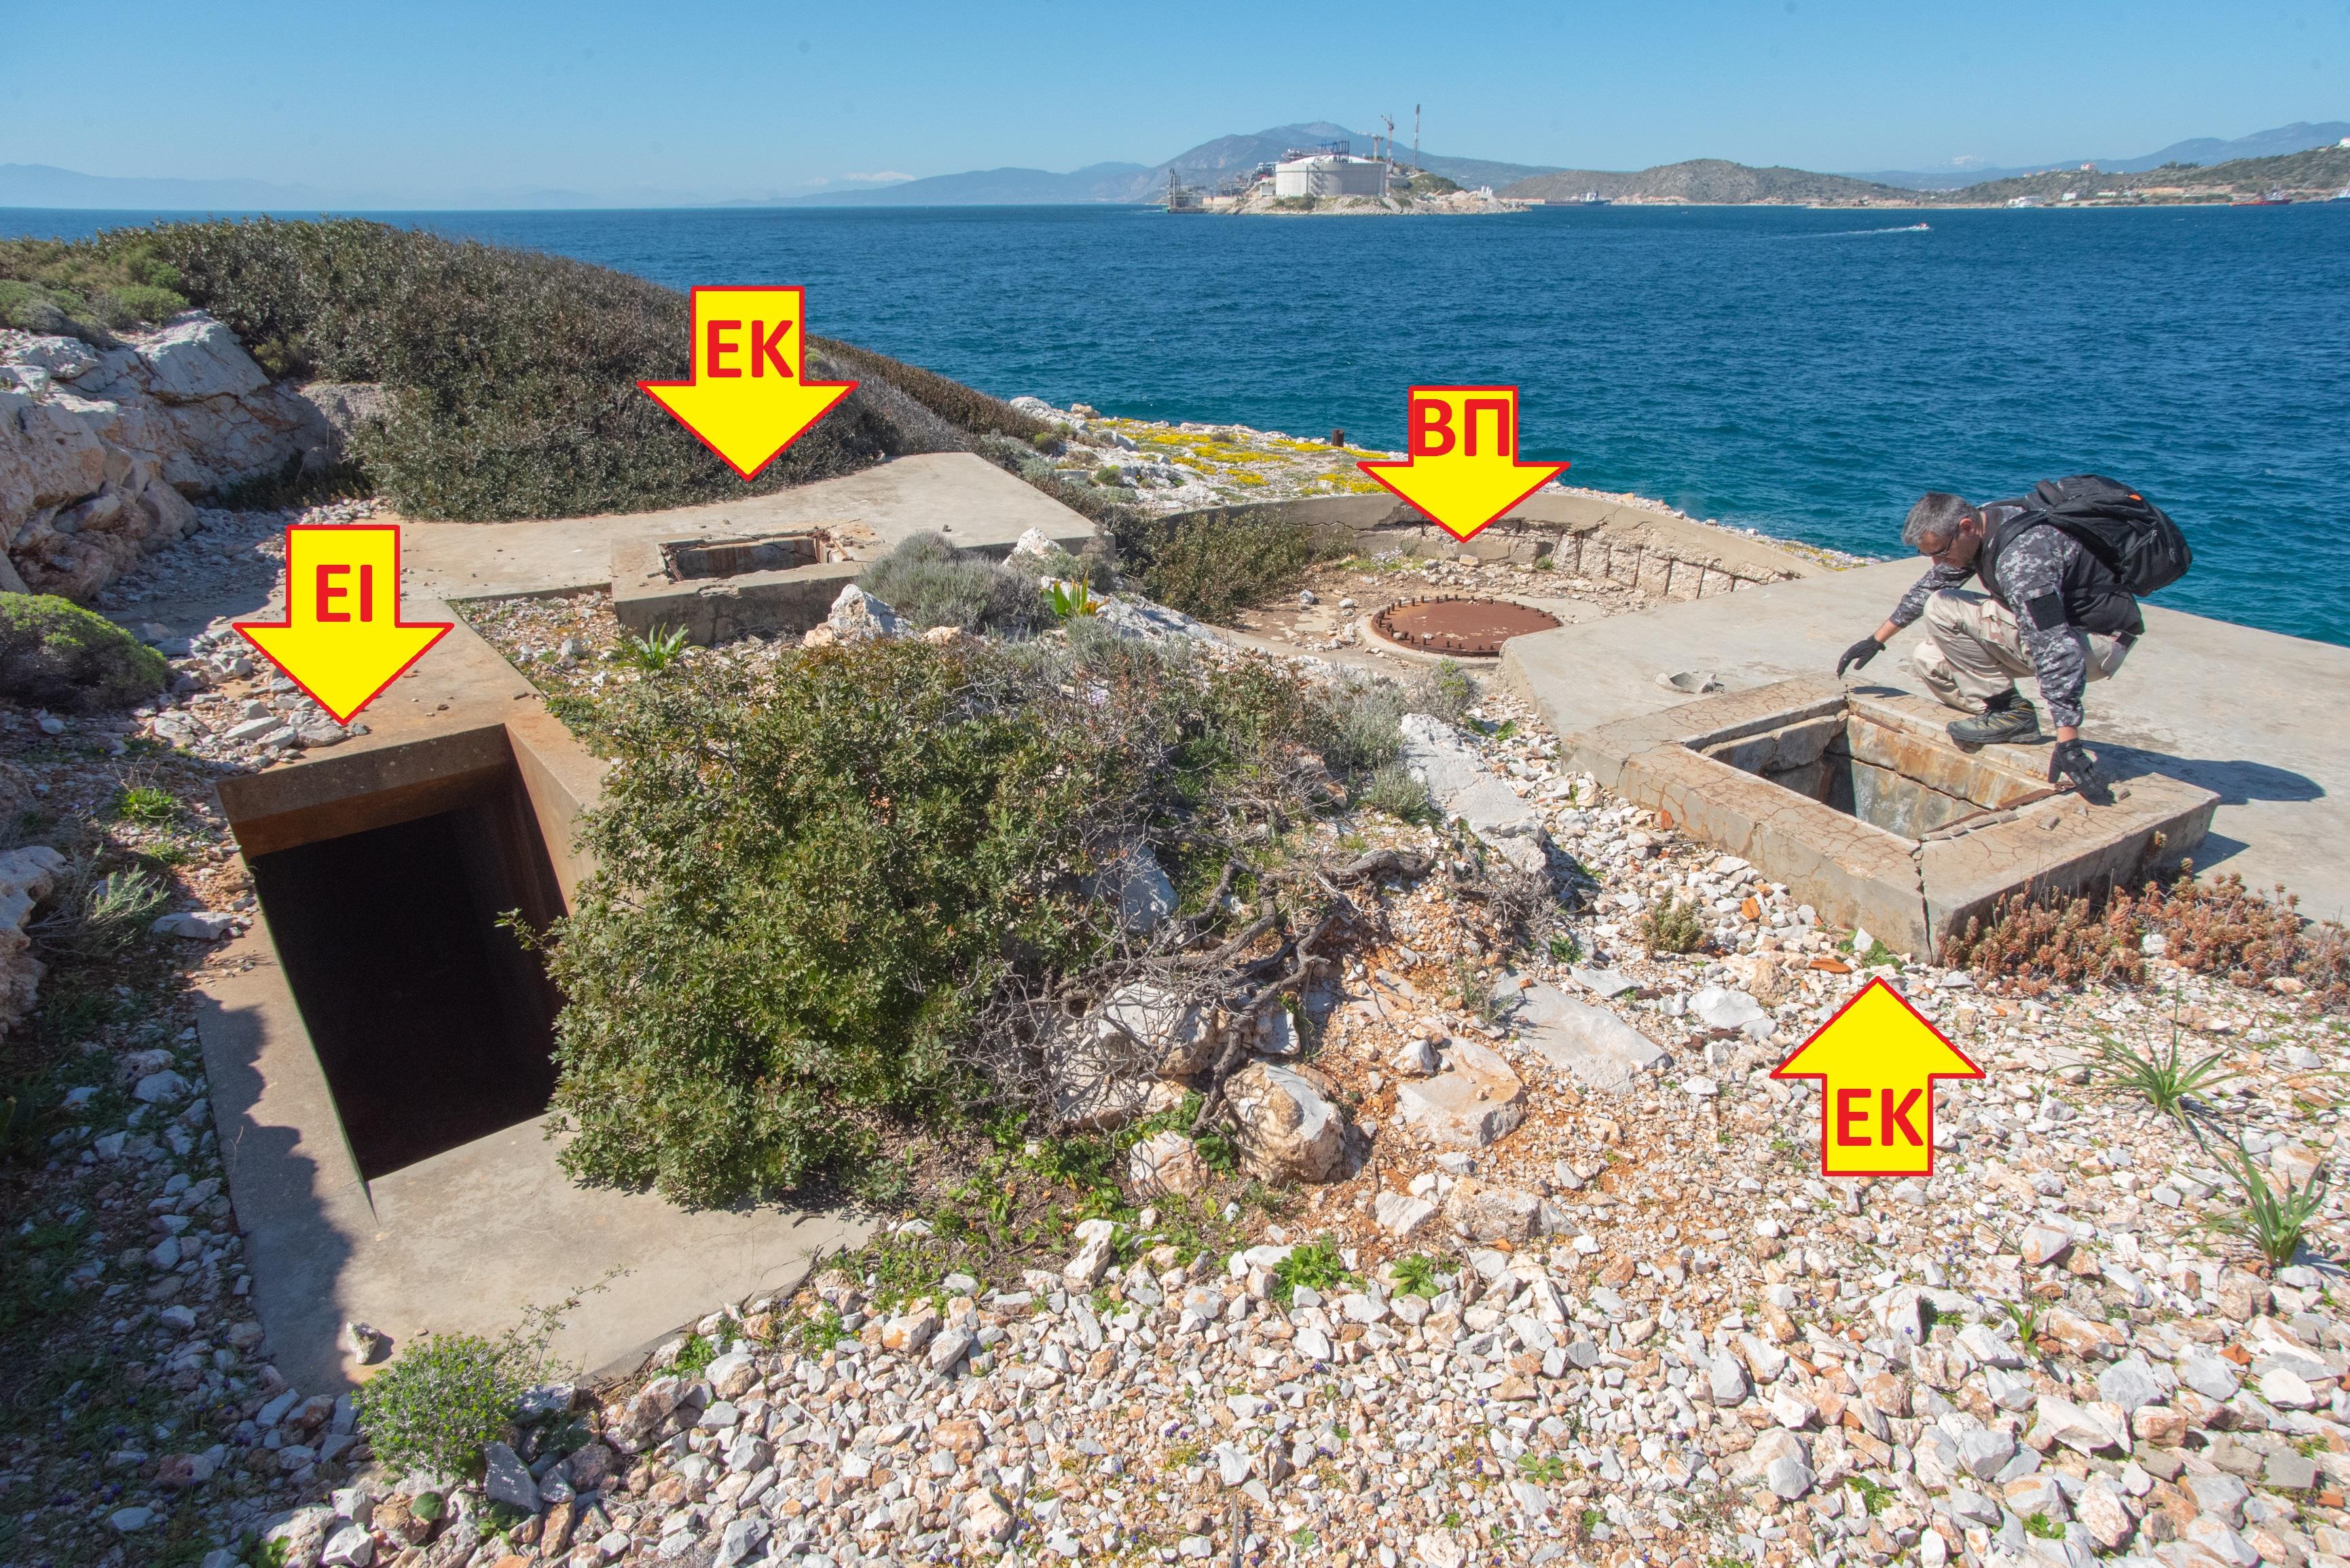 EI=Entrance EK=Emergency Exit BΠ=Gun position